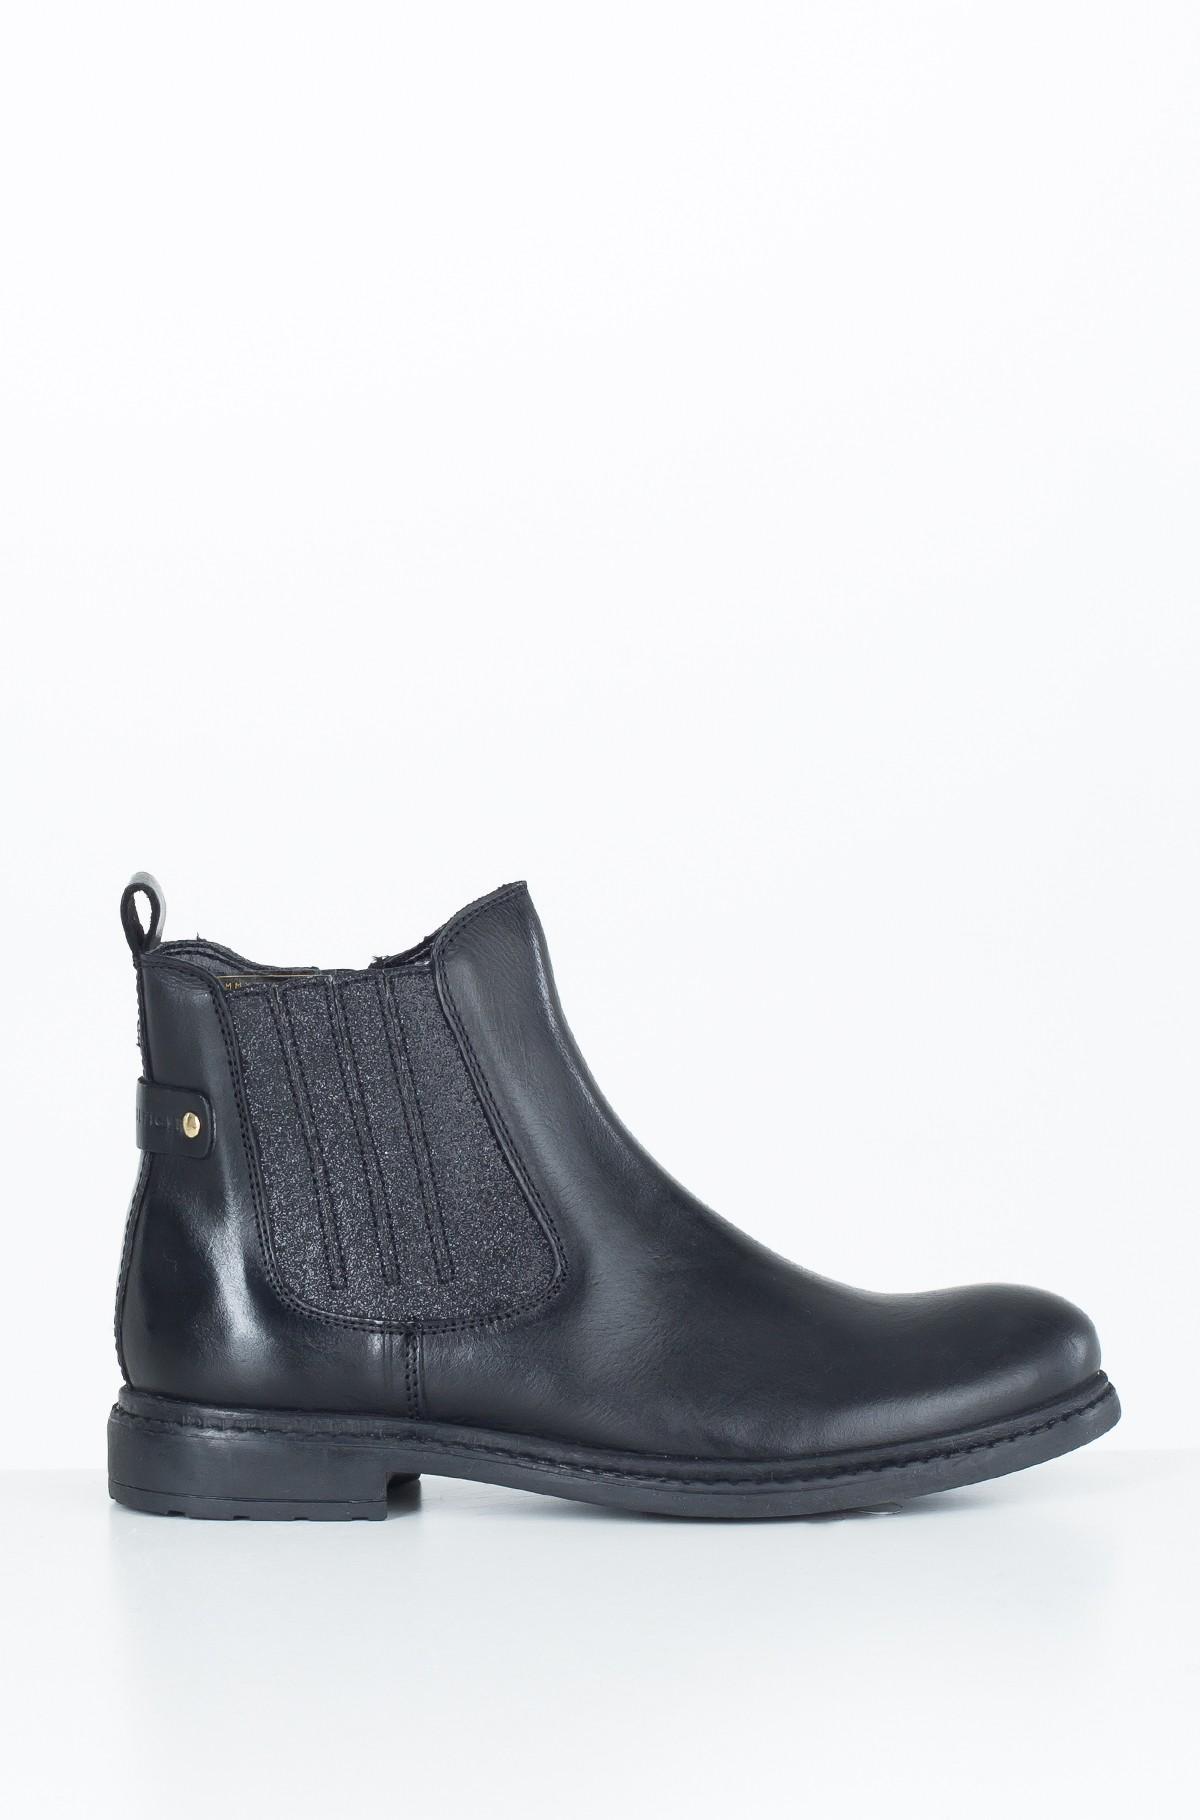 Vaikiški batai T4A5-30053-0283999-full-1